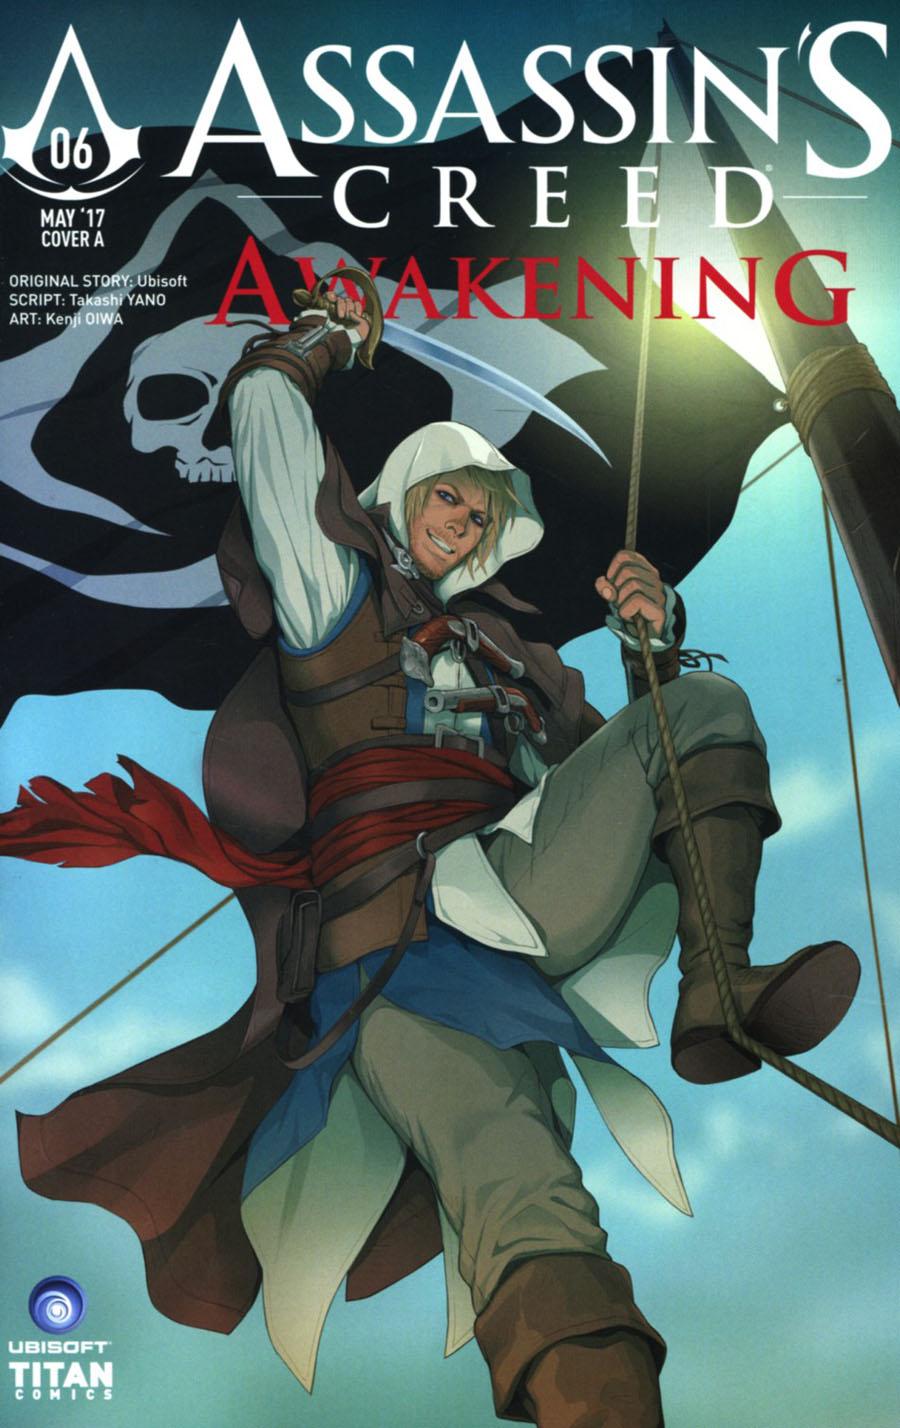 Assassins Creed Awakening #6 Cover A Regular Doubleleaf Cover